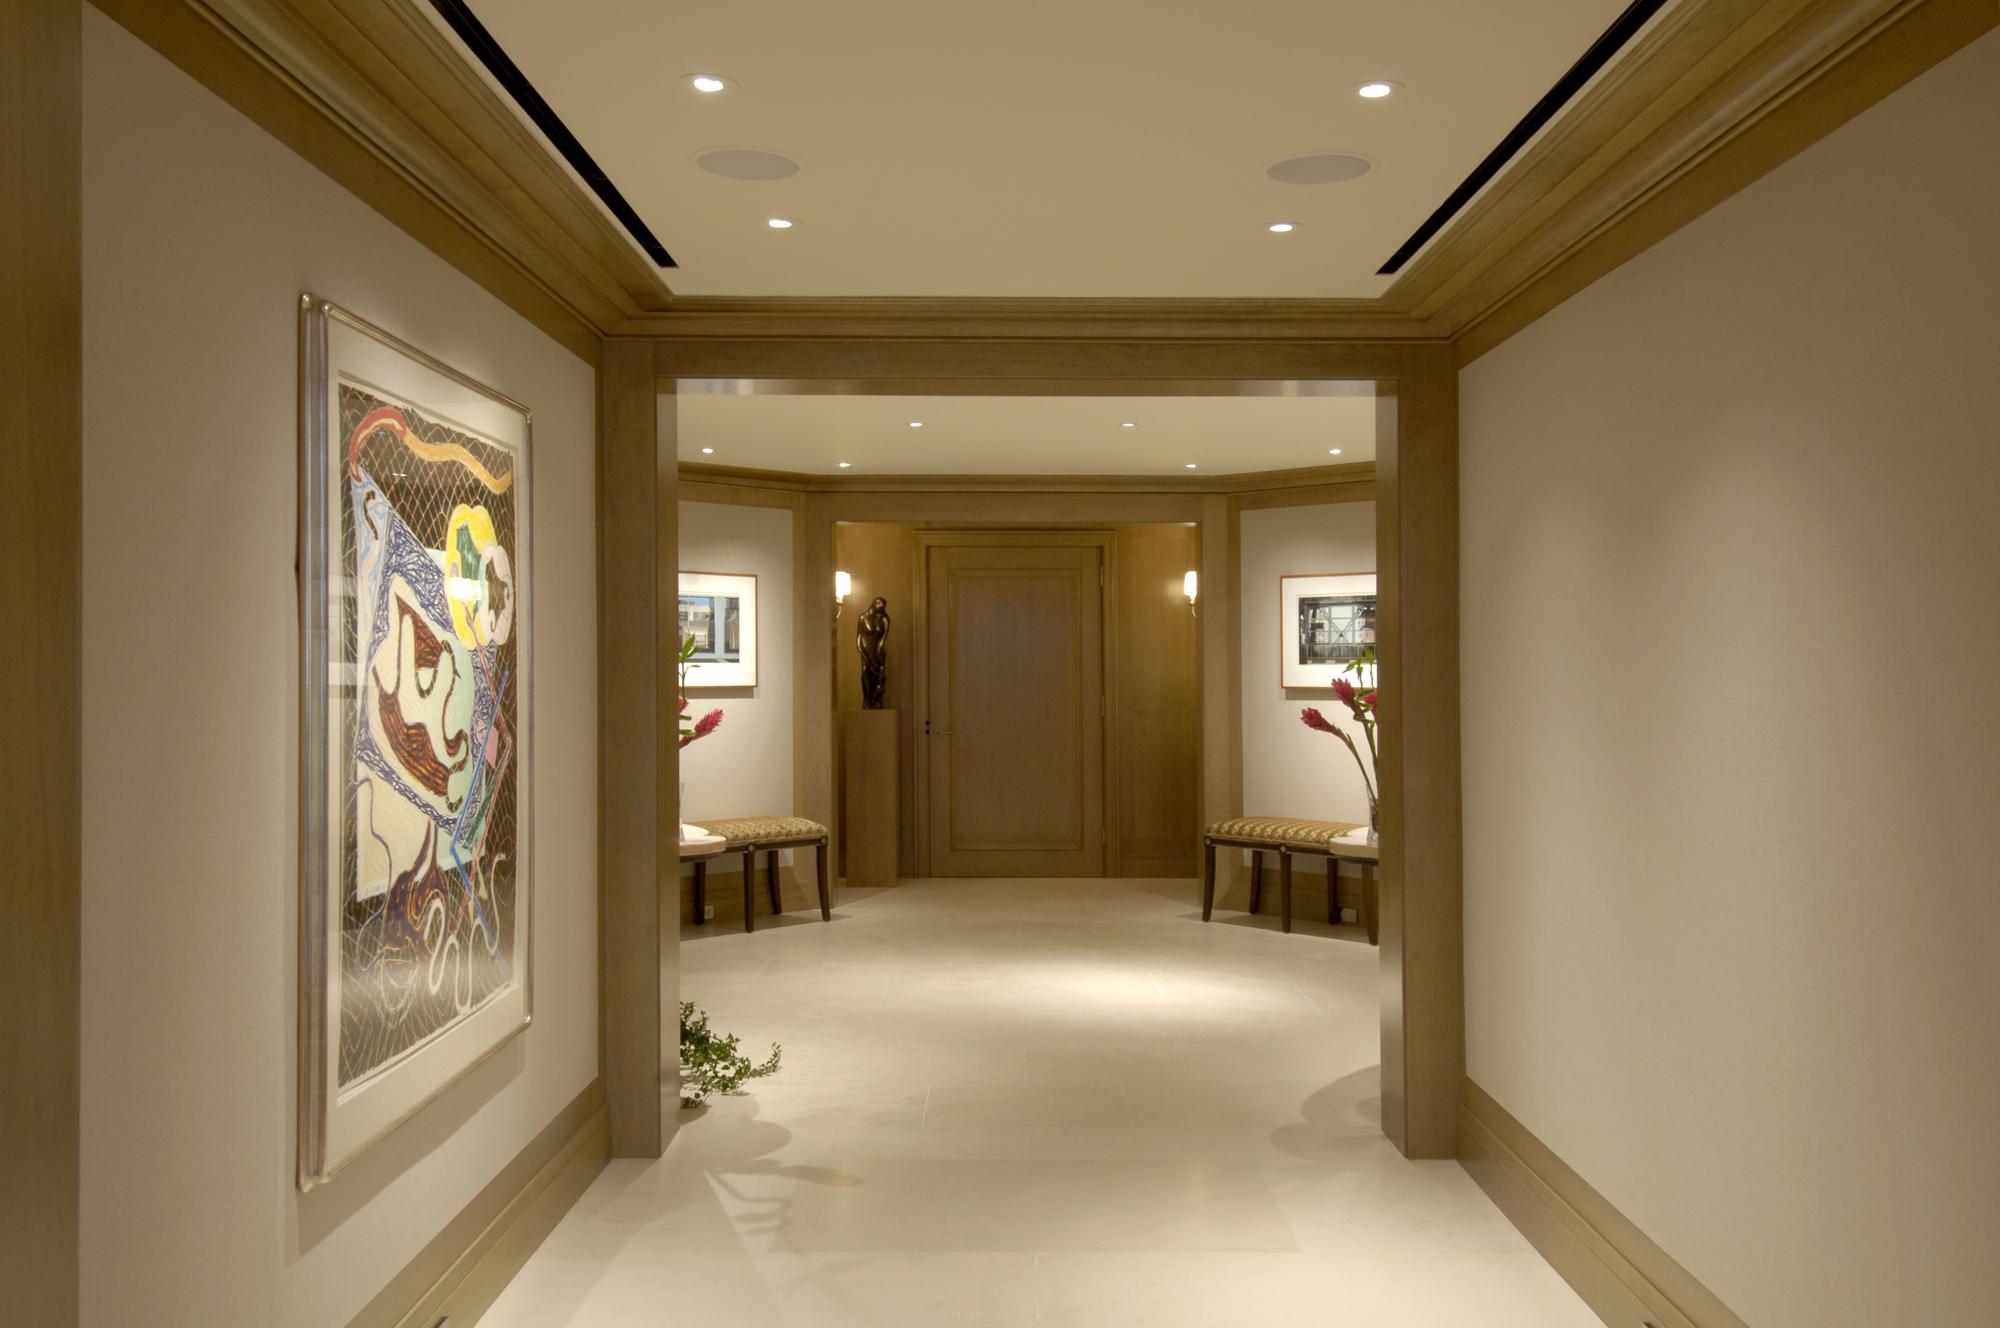 Condo Foyer Design : Award winning condominium penthouse renovation in